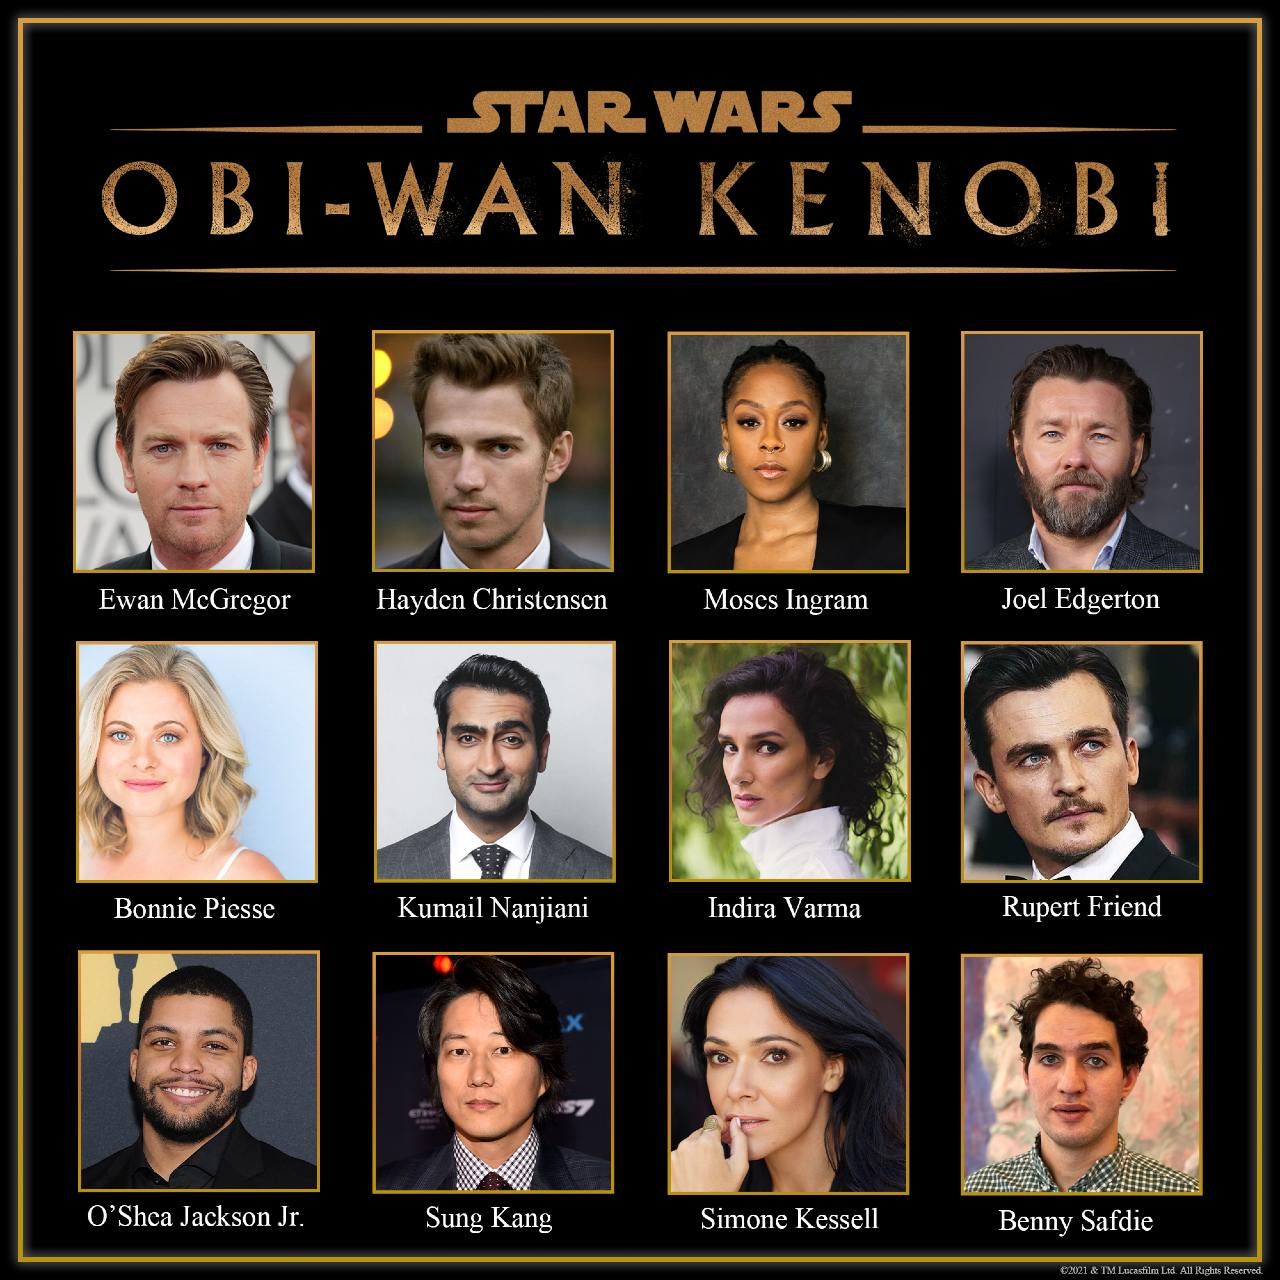 Star Wars Jar Jar Binks no estará Obi-Wan Kenobi